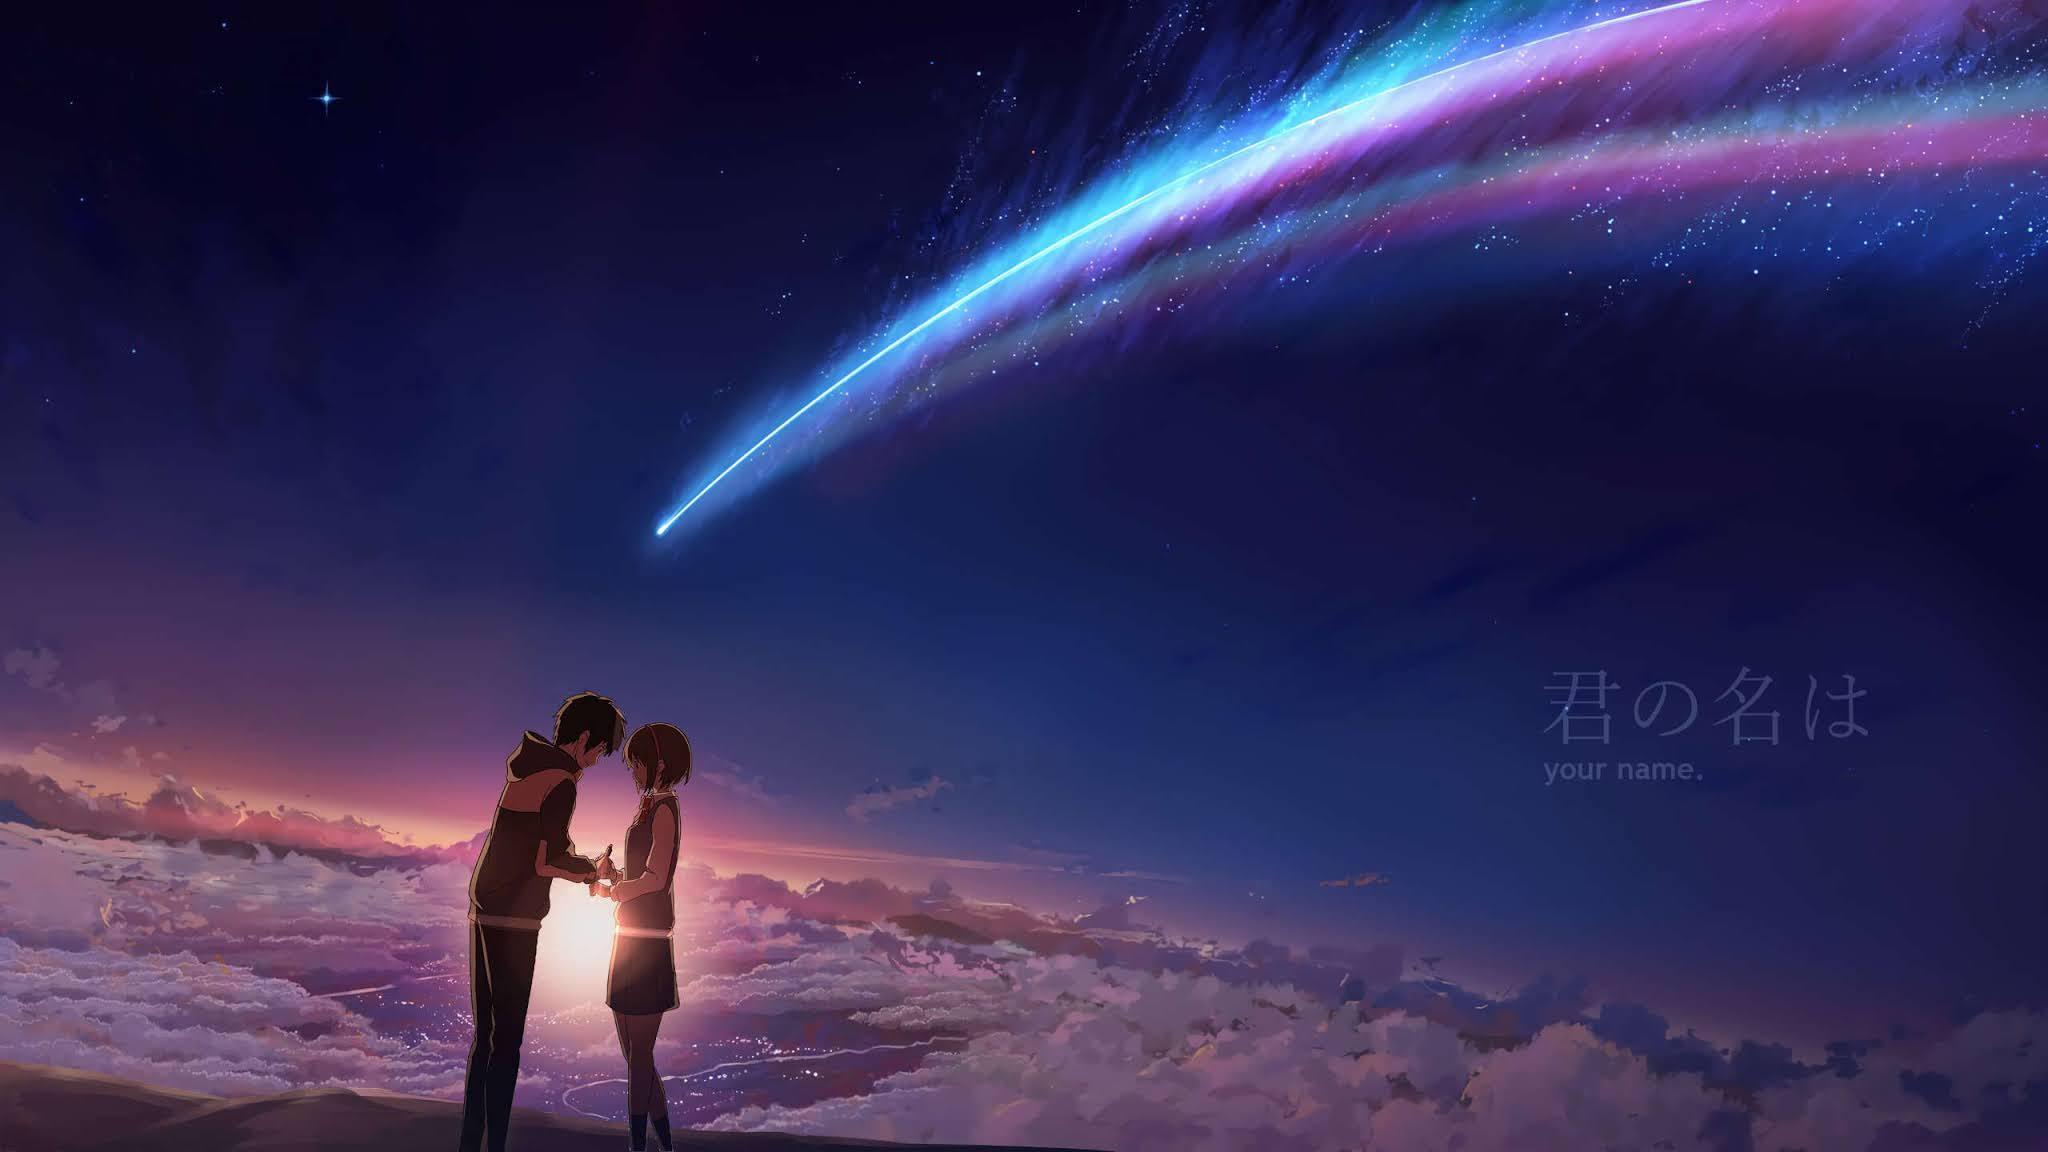 Anime romantis kimi no nawa desktop